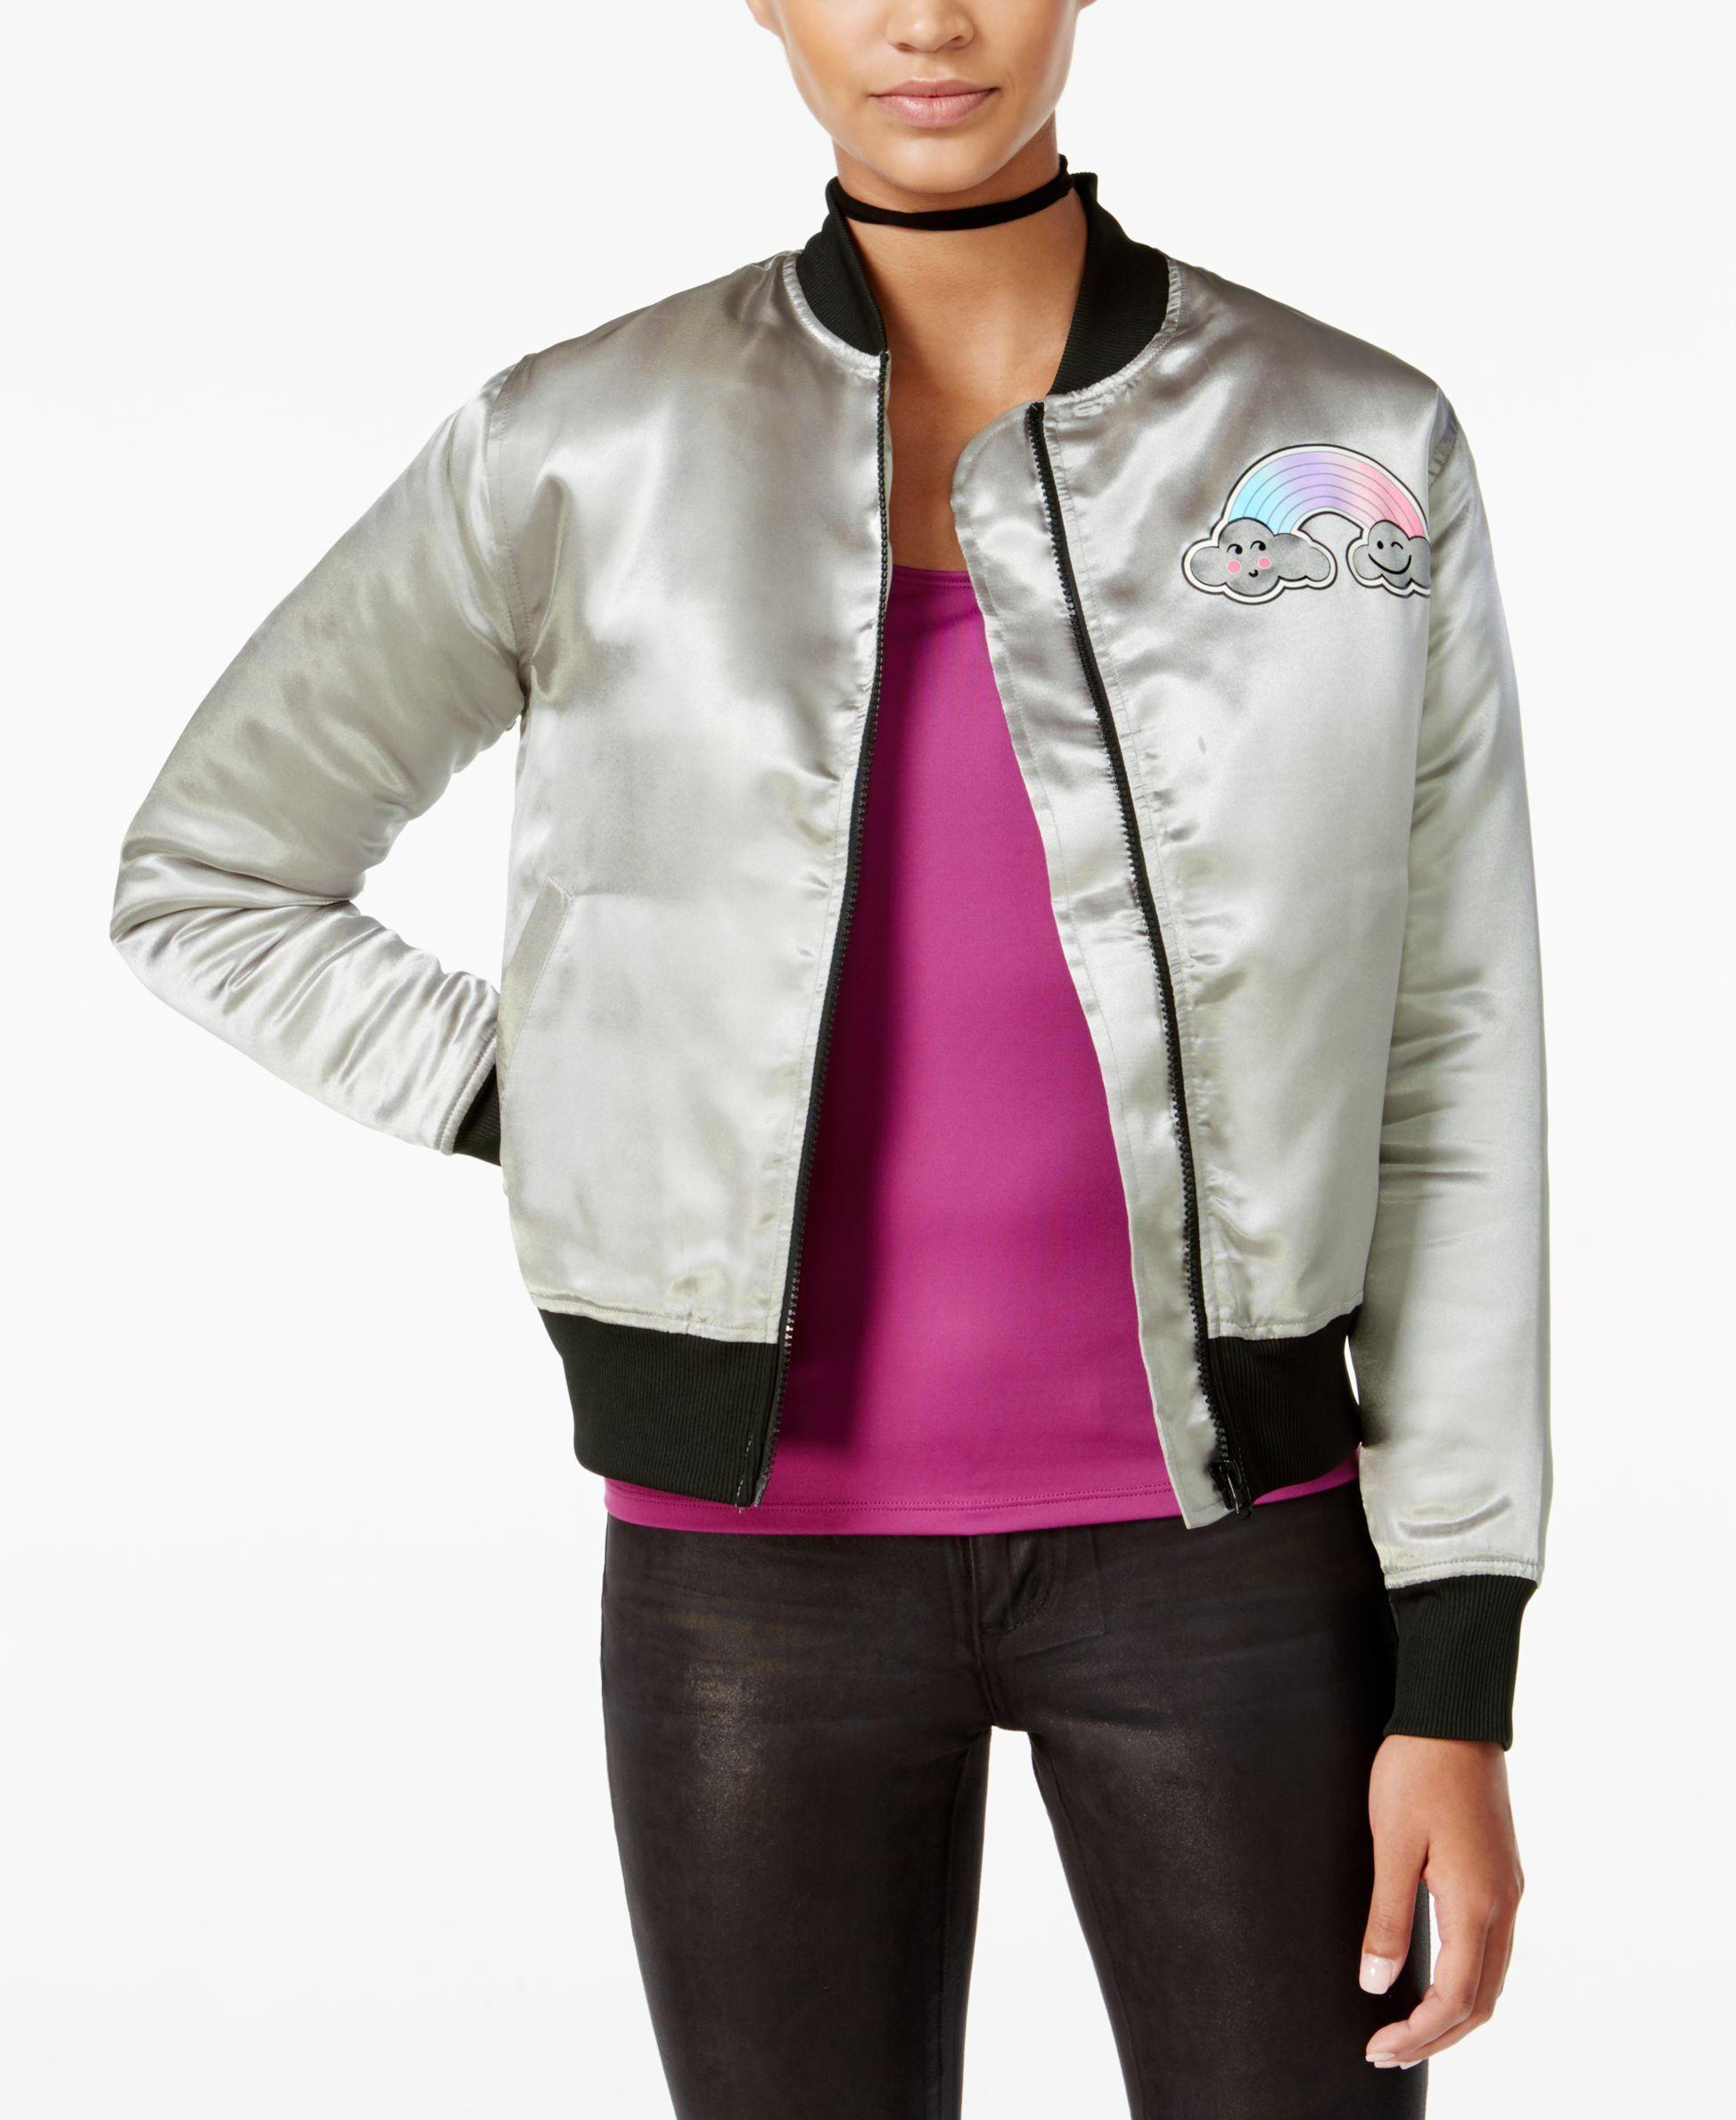 Dreamworks Trolls Juniors Twins Graphic Bomber Jacket Bomber Jacket Jackets Vest Jacket [ 2378 x 1947 Pixel ]